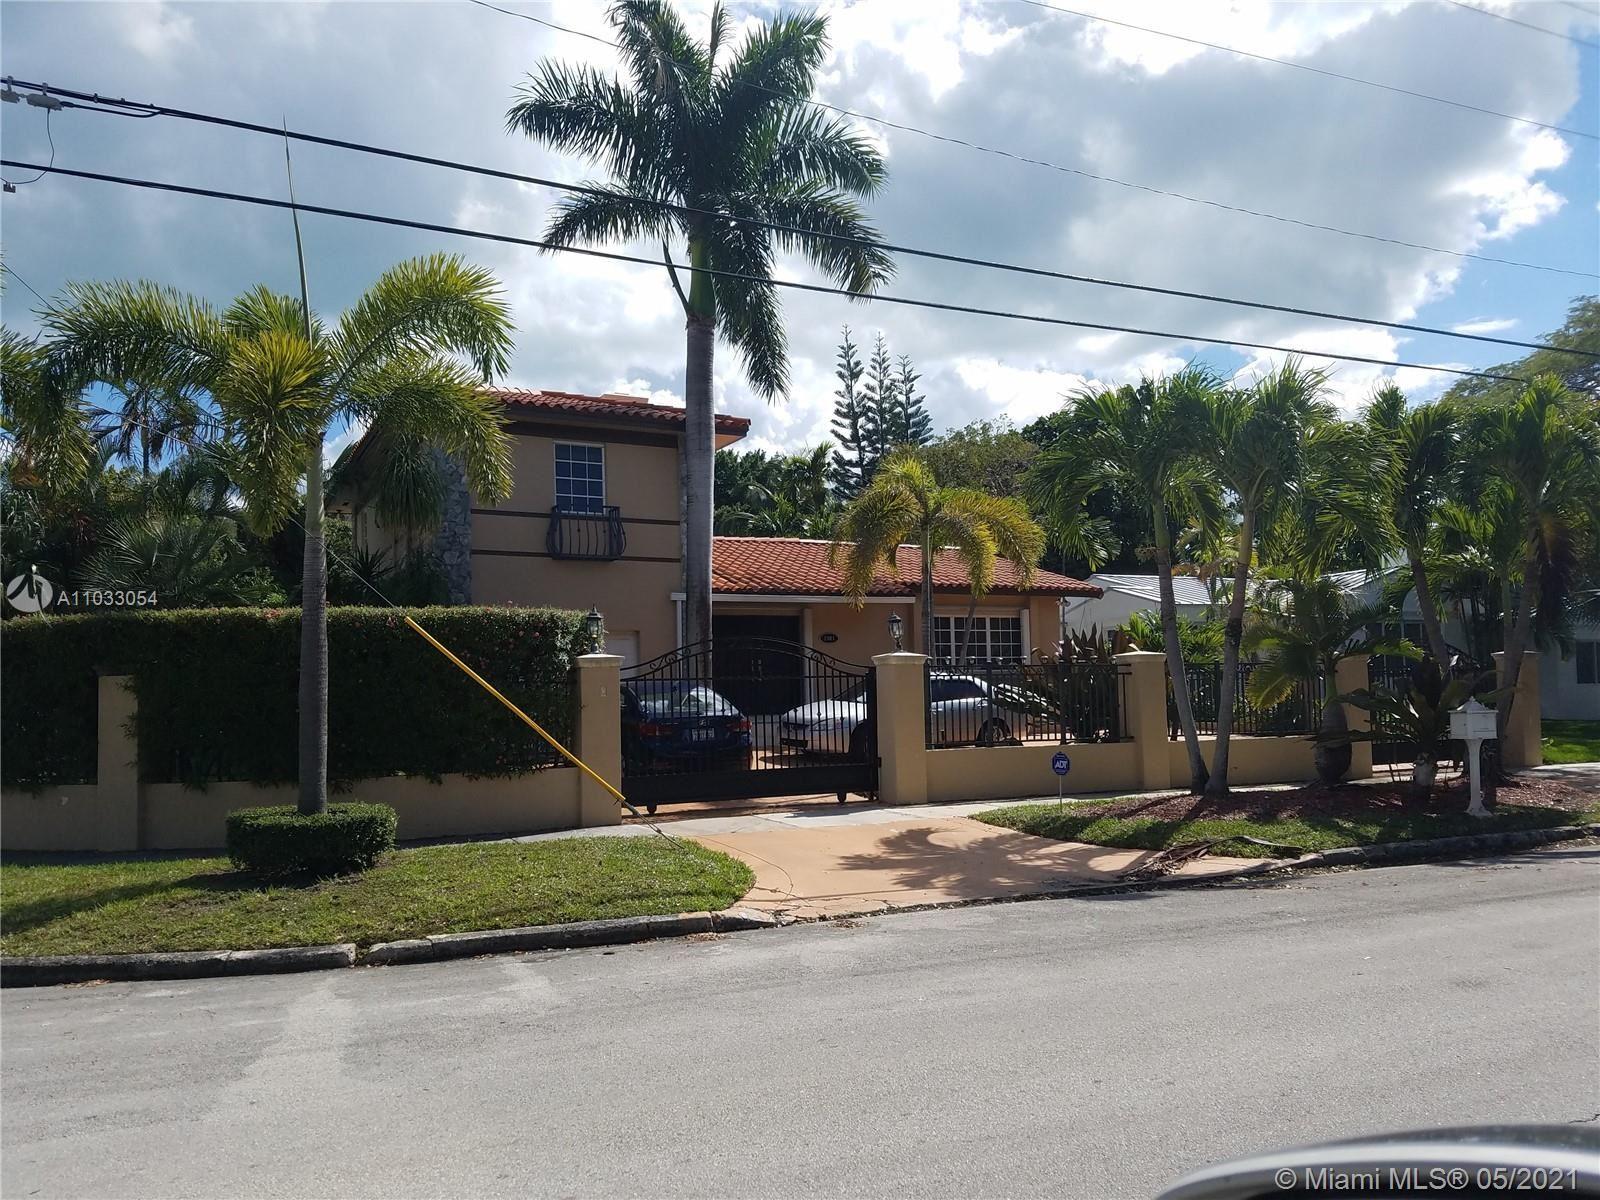 2901 SW 2nd Ave, Miami, FL 33129 - #: A11033054